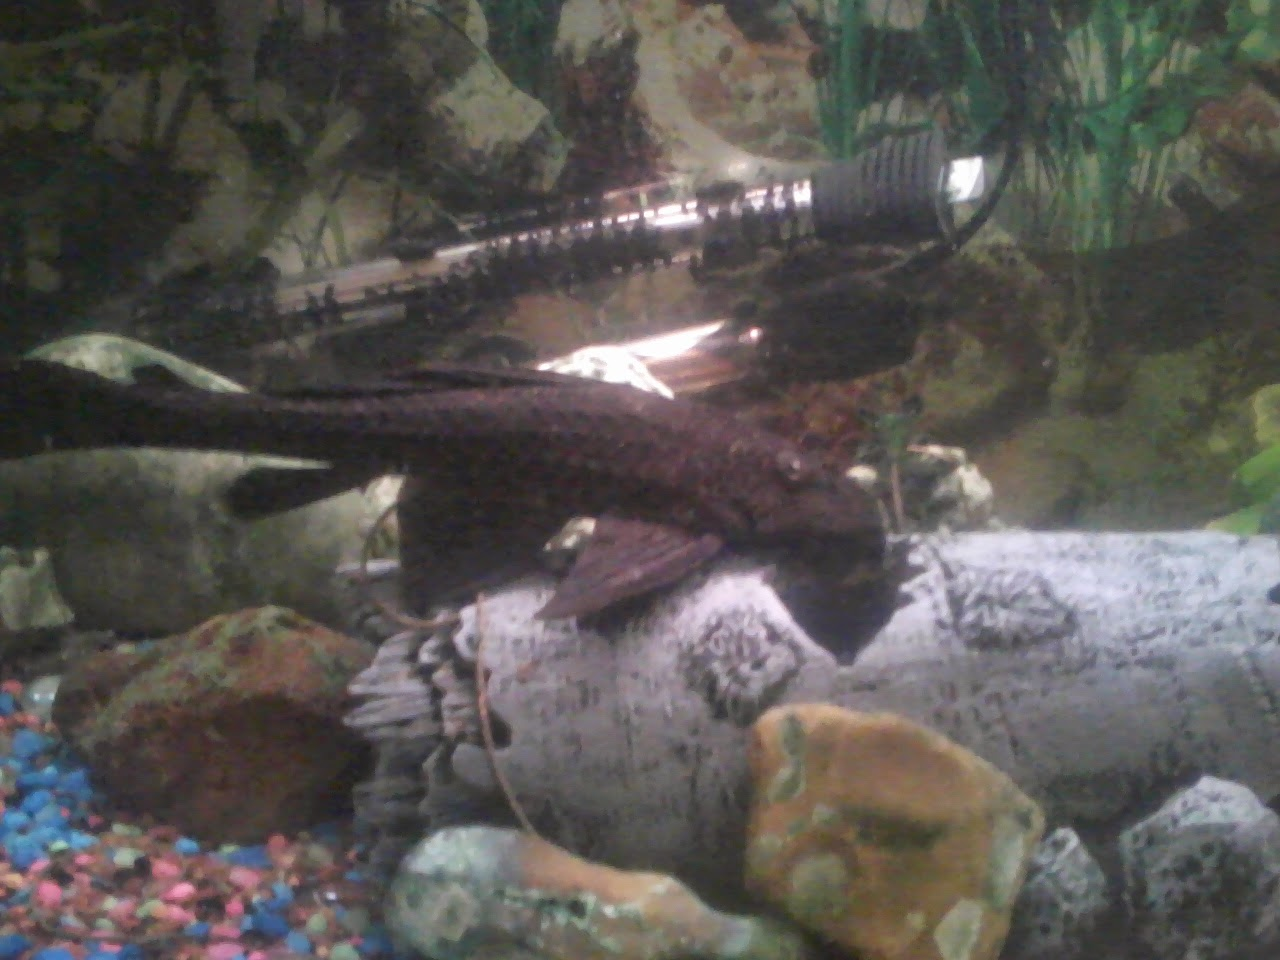 Fish - 1119184129.jpg